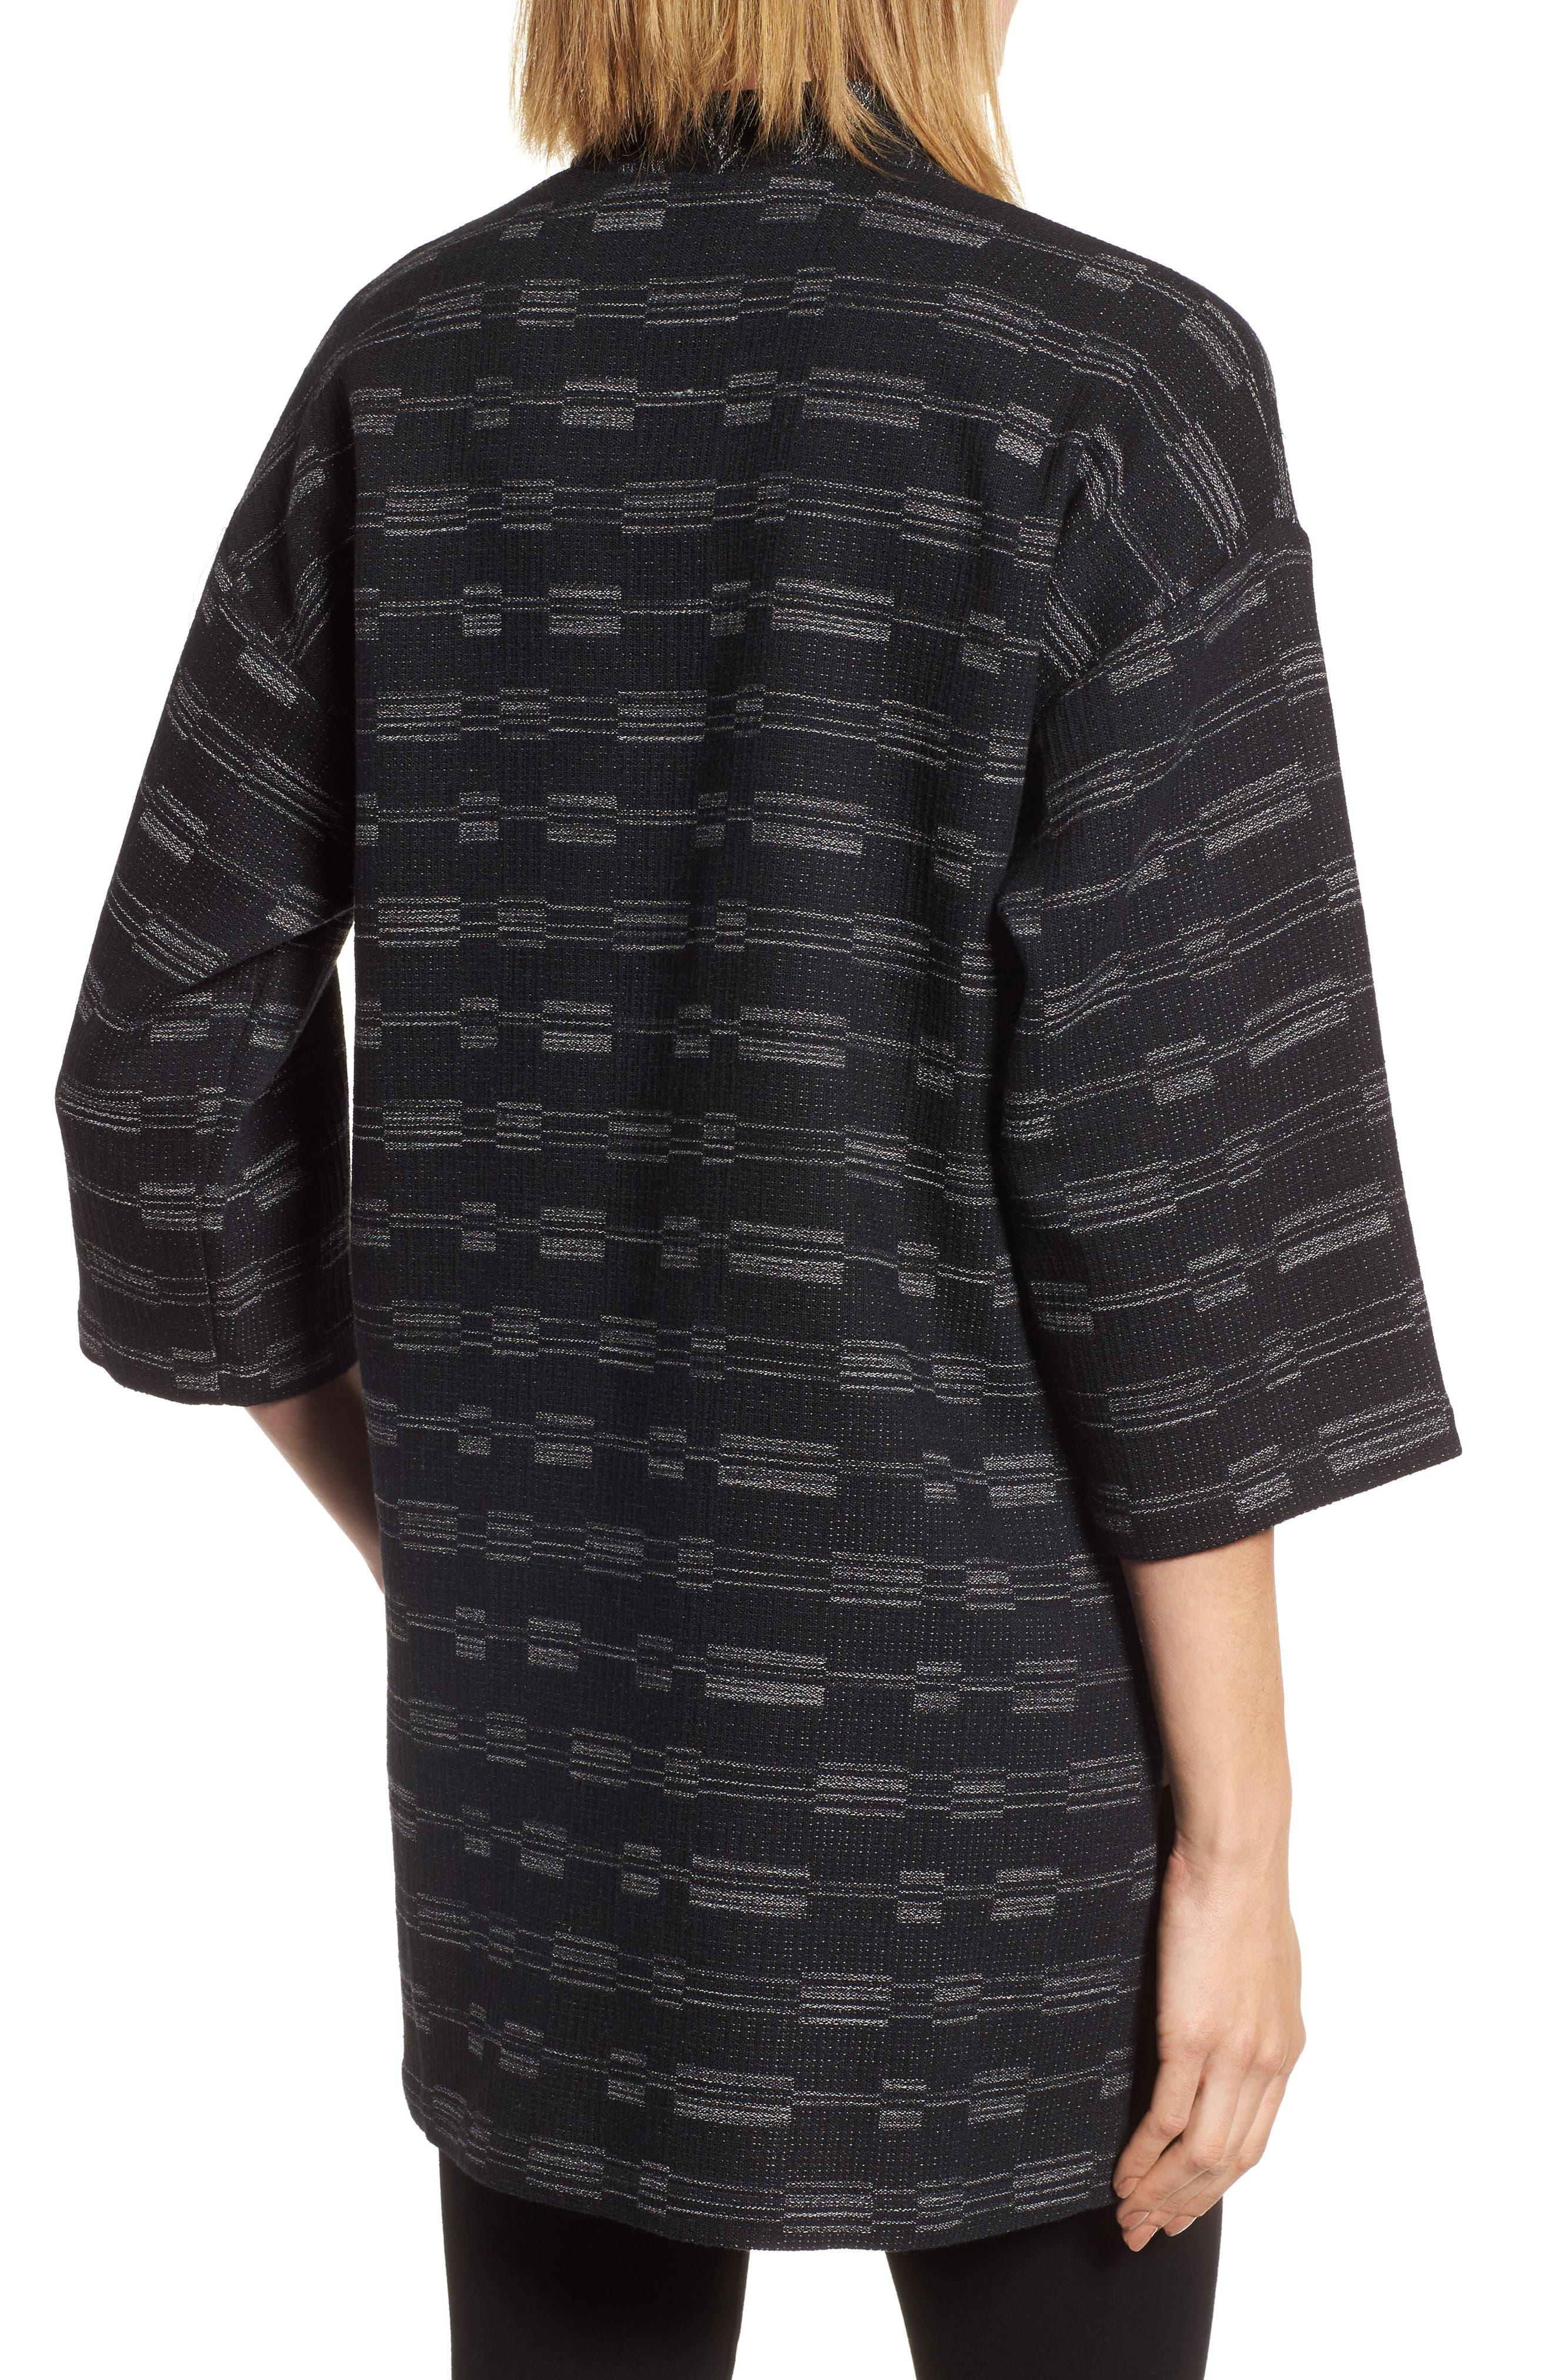 Organic Cotton Blend Tweed Jacket,                             Alternate thumbnail 2, color,                             001